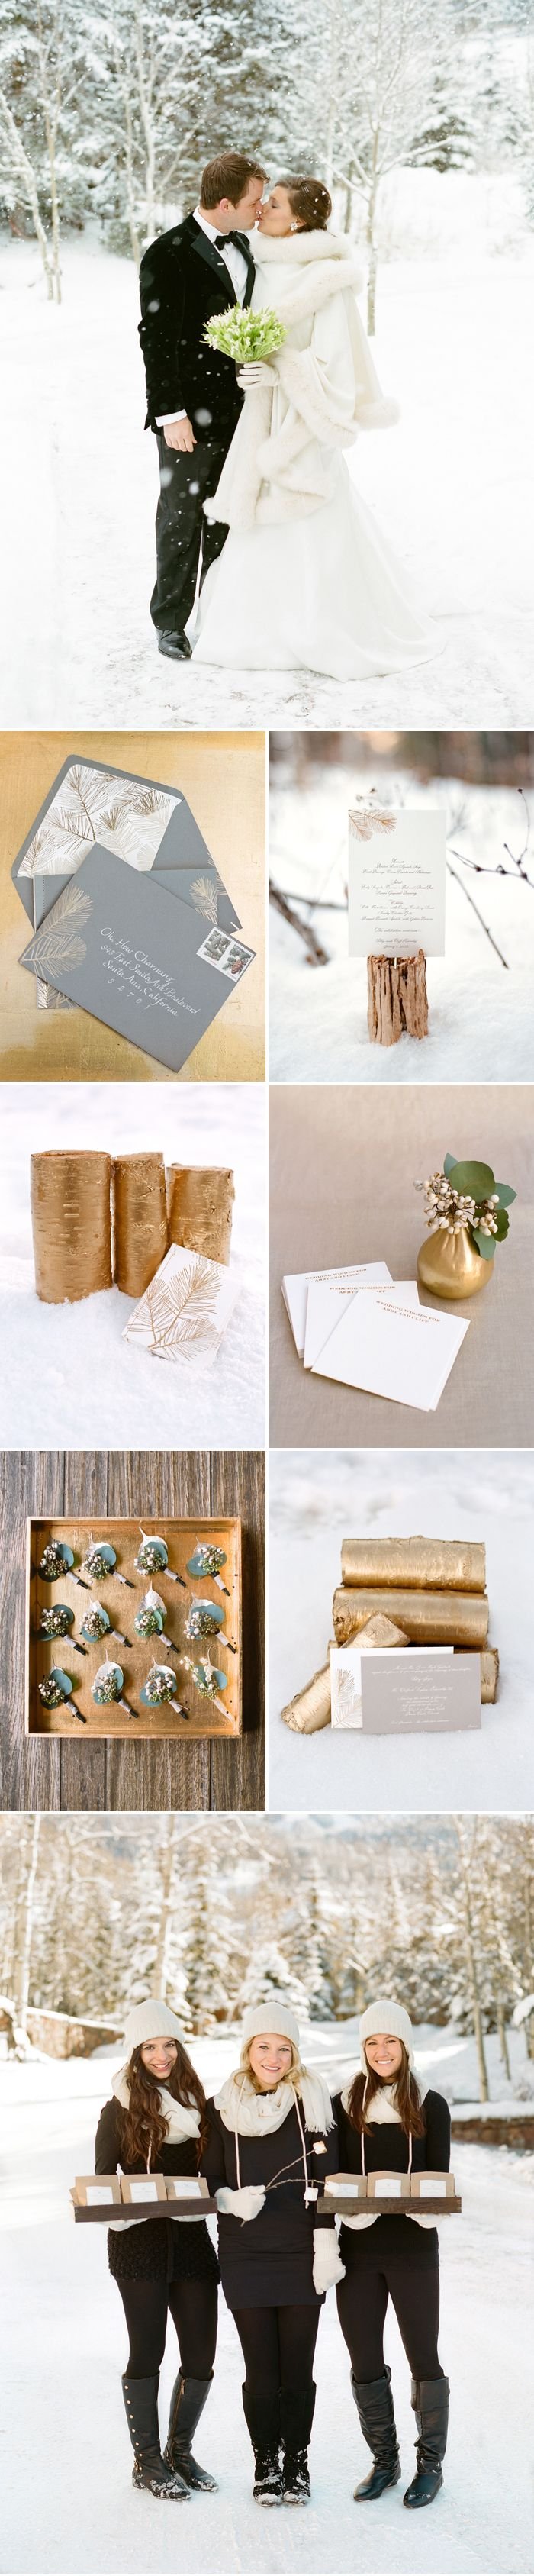 152 best Winter Weddings images on Pinterest | Winter barn weddings ...